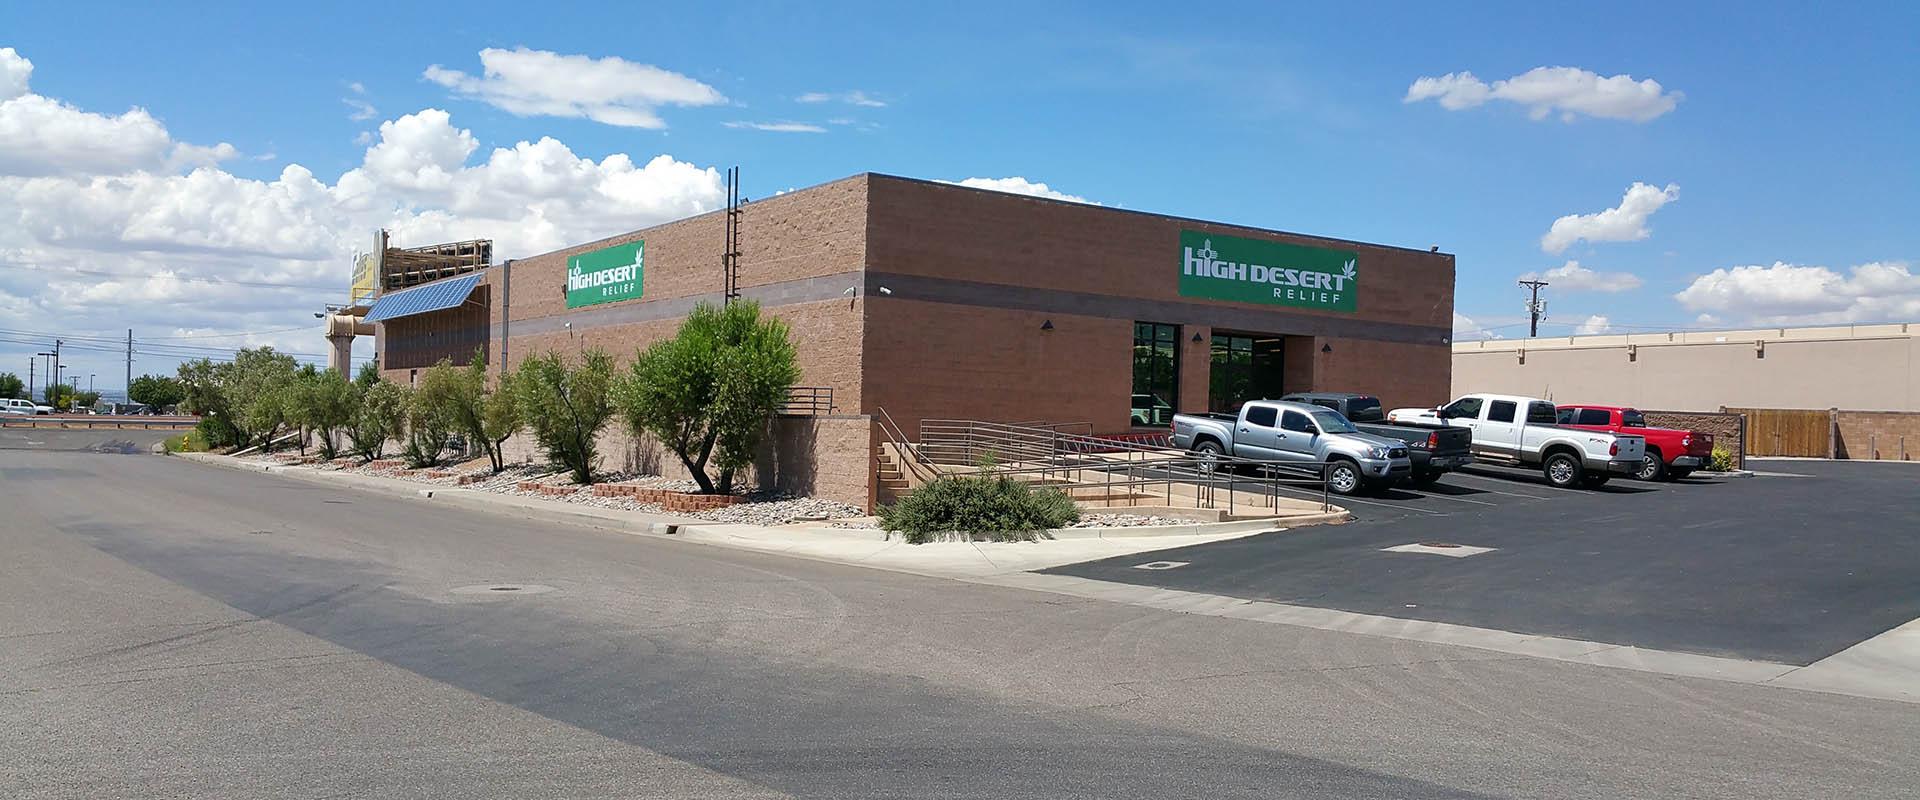 High Desert Relief Medical Cannabis Dispensary Albuquerque Nm